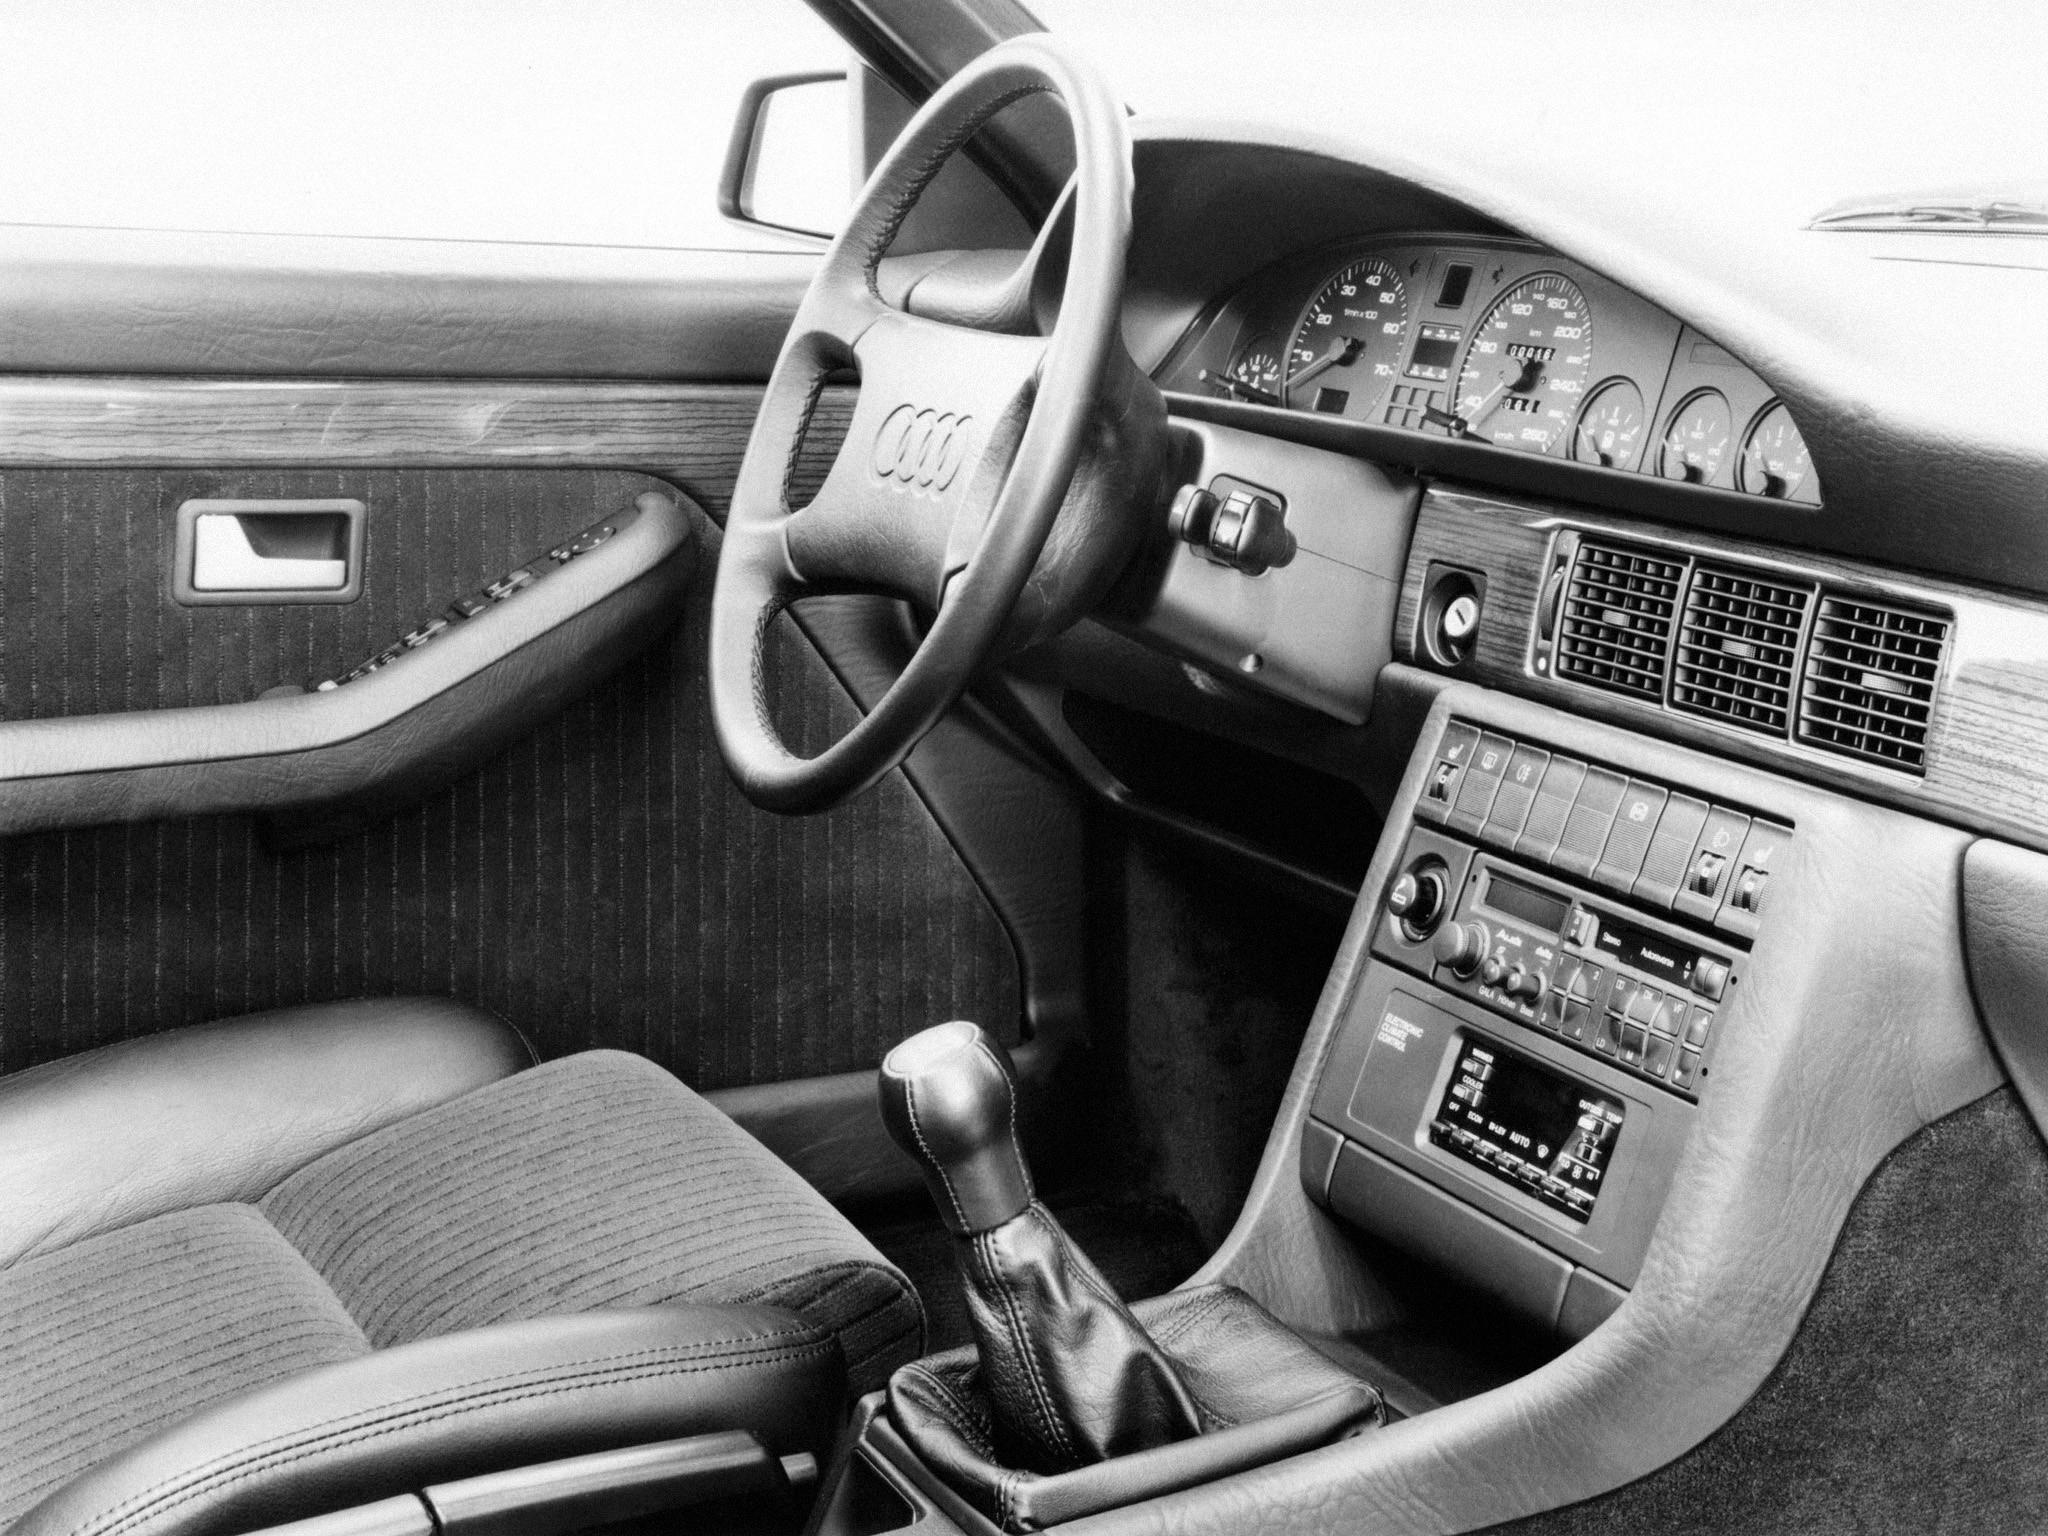 AUDI 200 specs & photos - 1984, 1985, 1986, 1987, 1988, 1989, 1990, 1991 - autoevolution